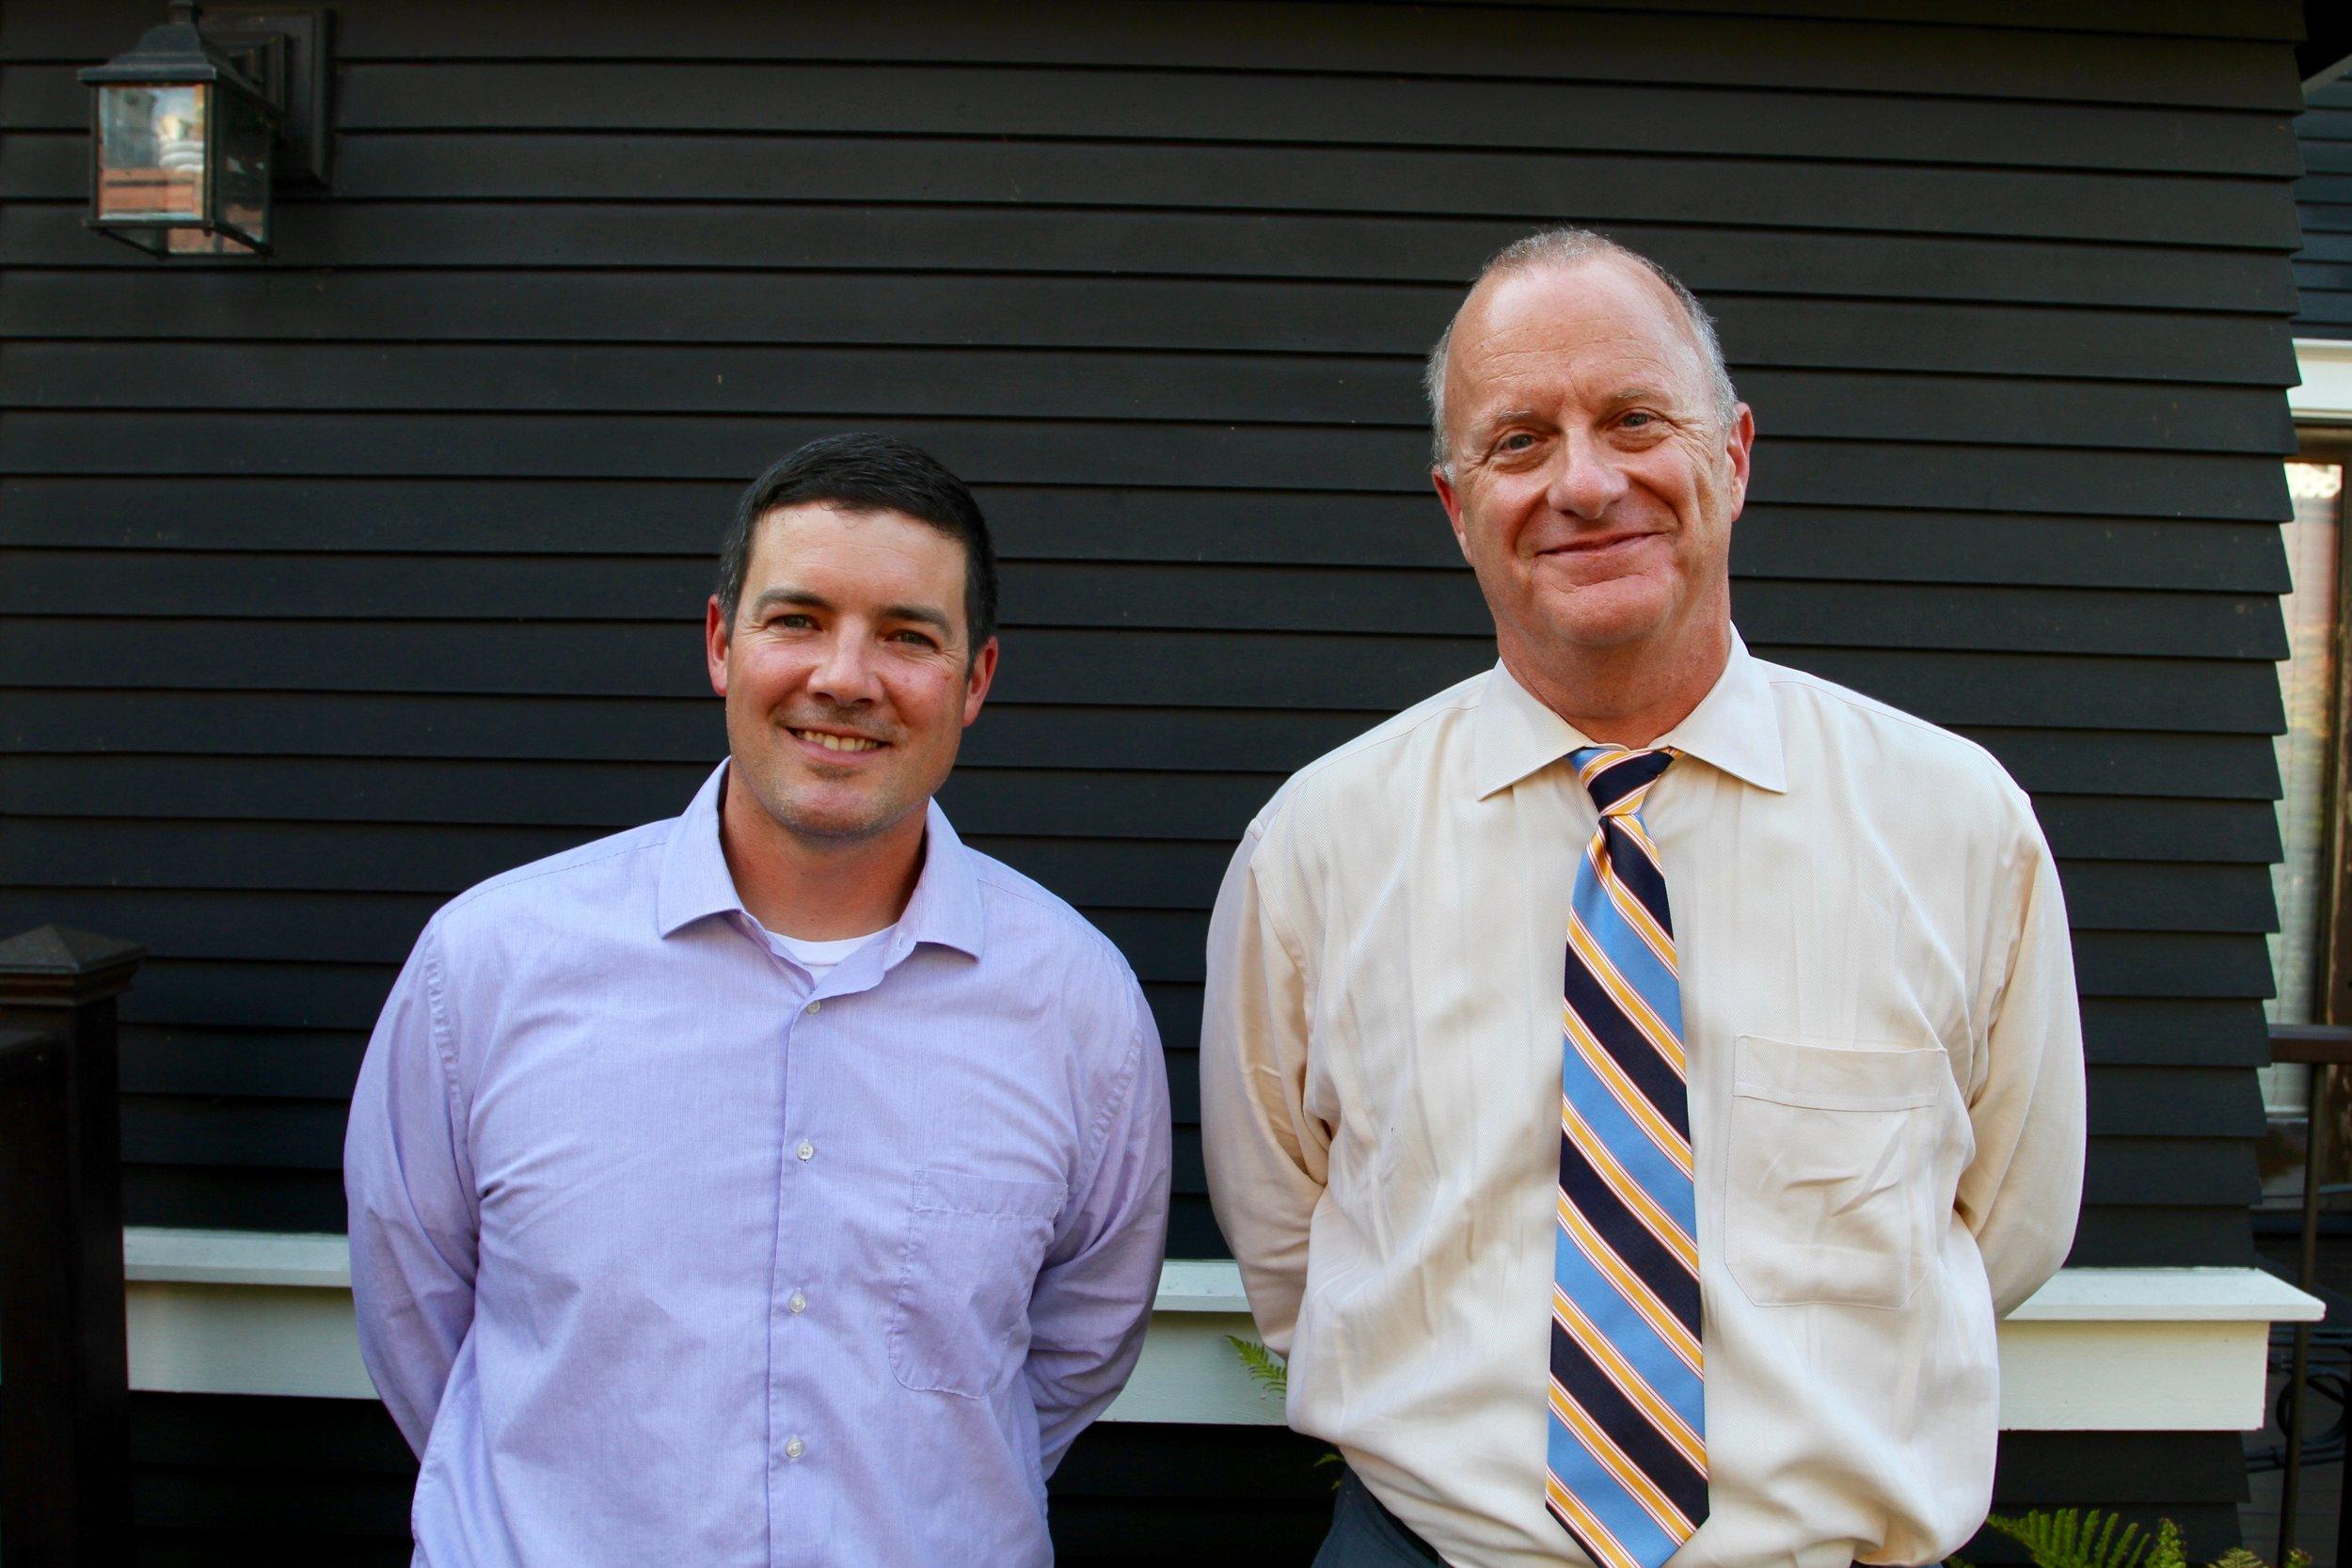 VP Joe Alonzo and Board Member Steve Erickson